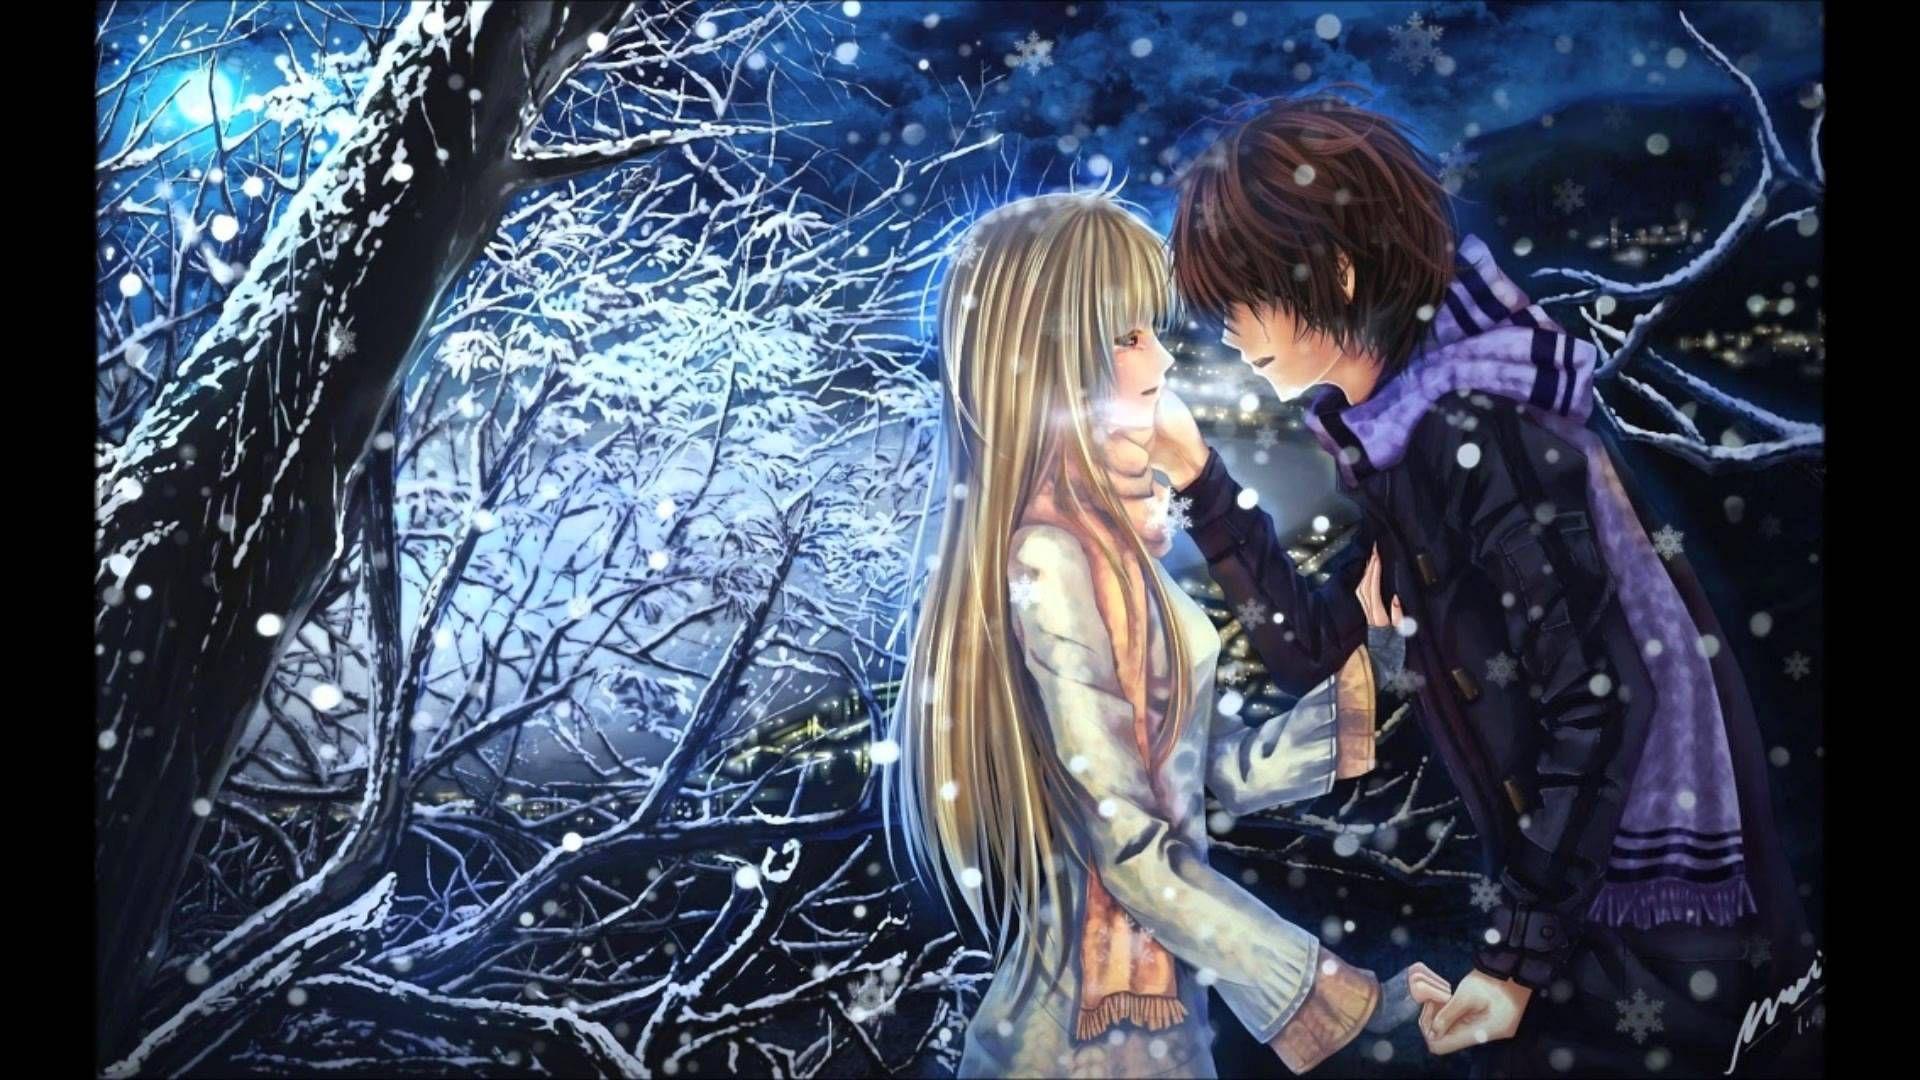 Anime Girl And Boy Wallpaper Full Hd Anime Girl And Boy